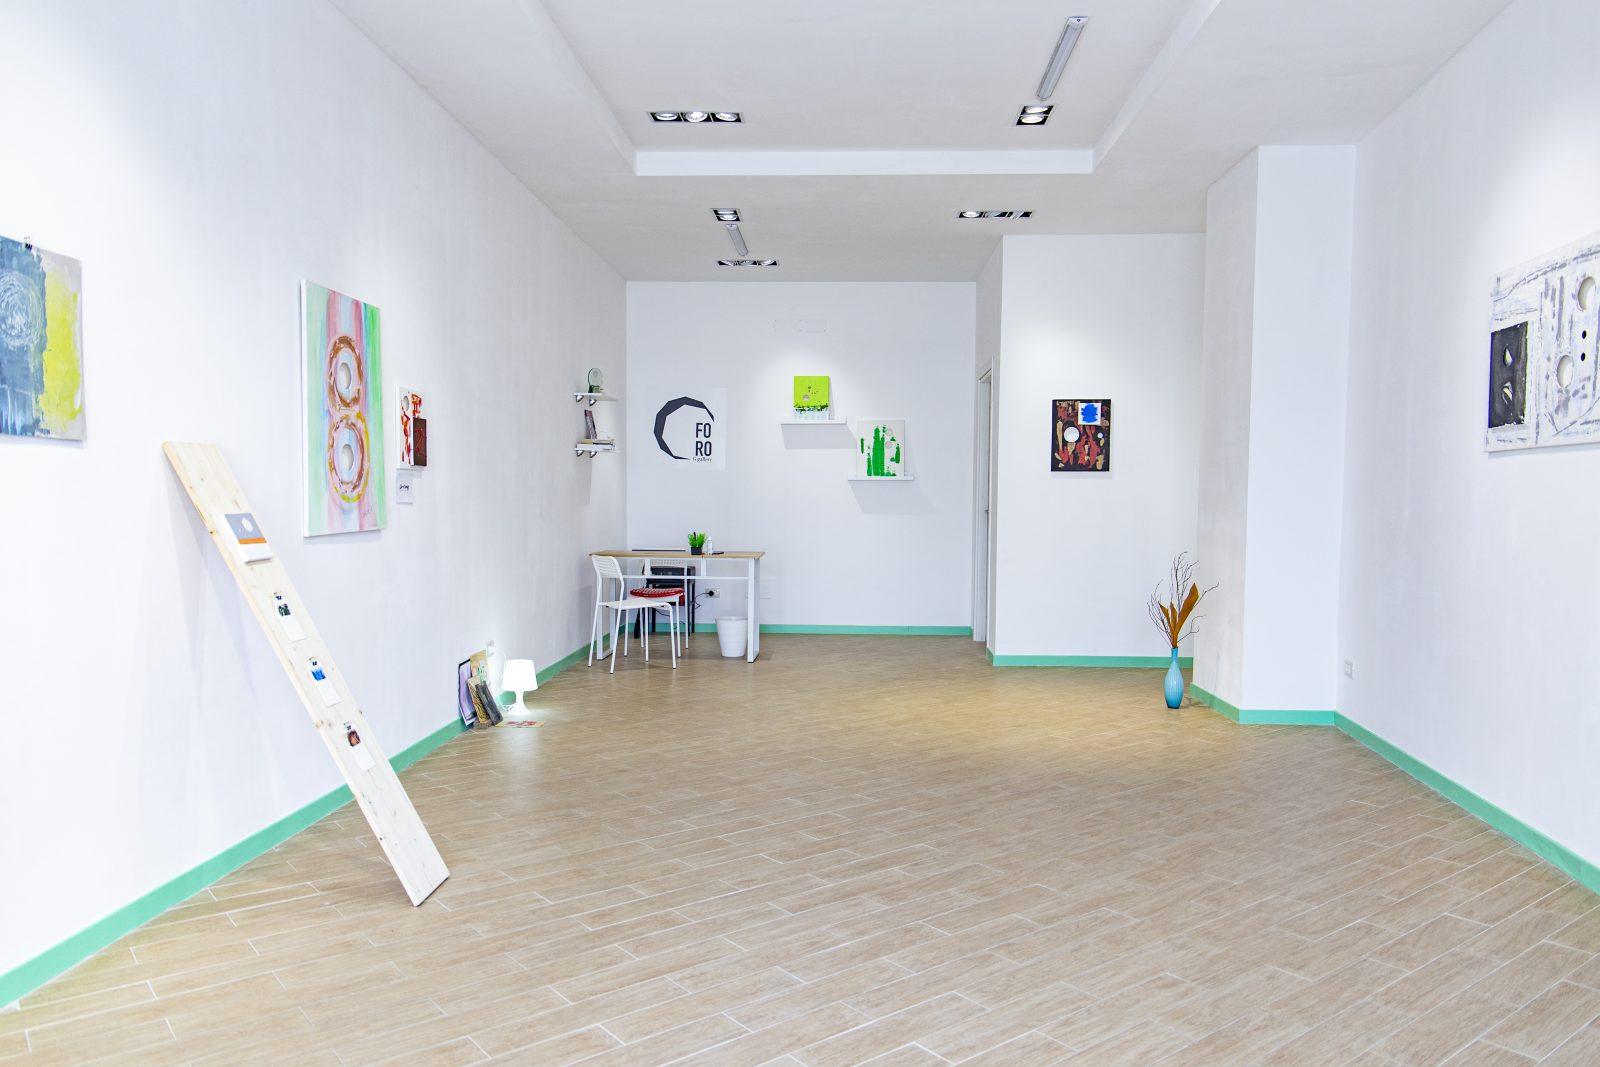 foro gallery, galleria d'arte di roberta guarnera a messina